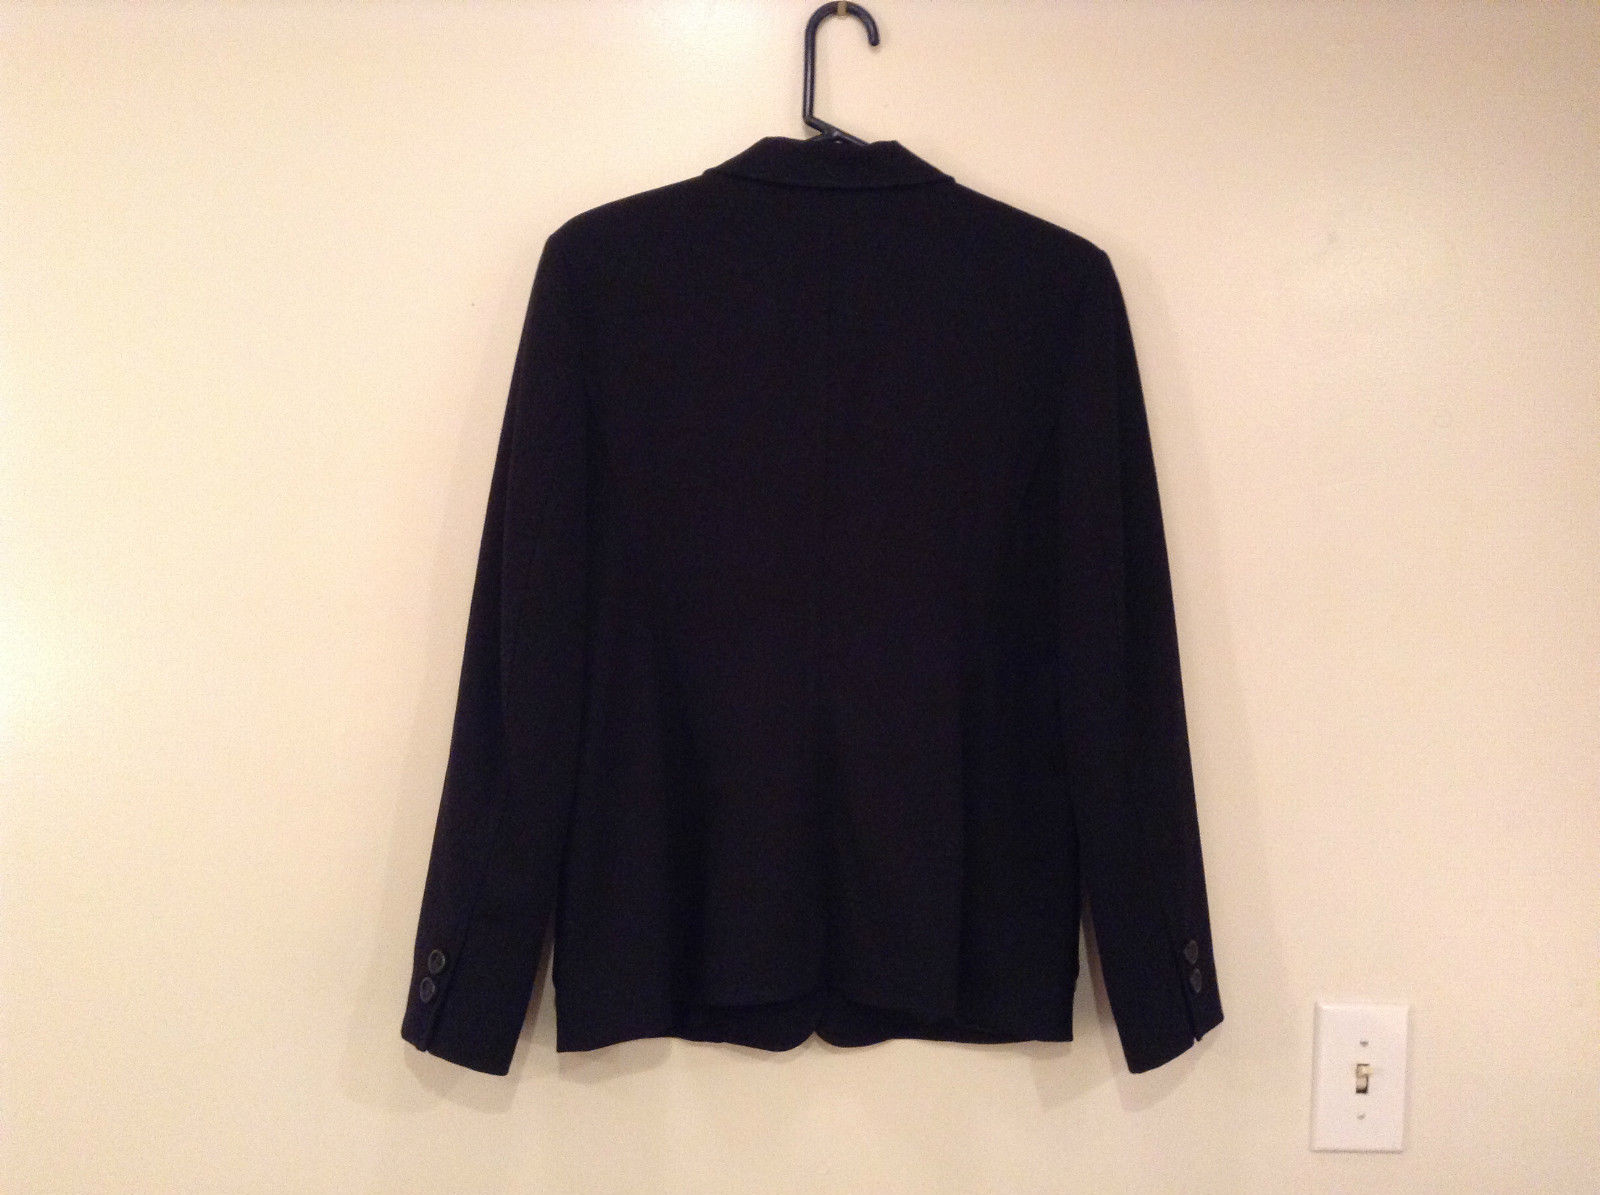 Milano Black Size 11 to 12 Lined Blazer 3 Button Closure Decorative Pockets